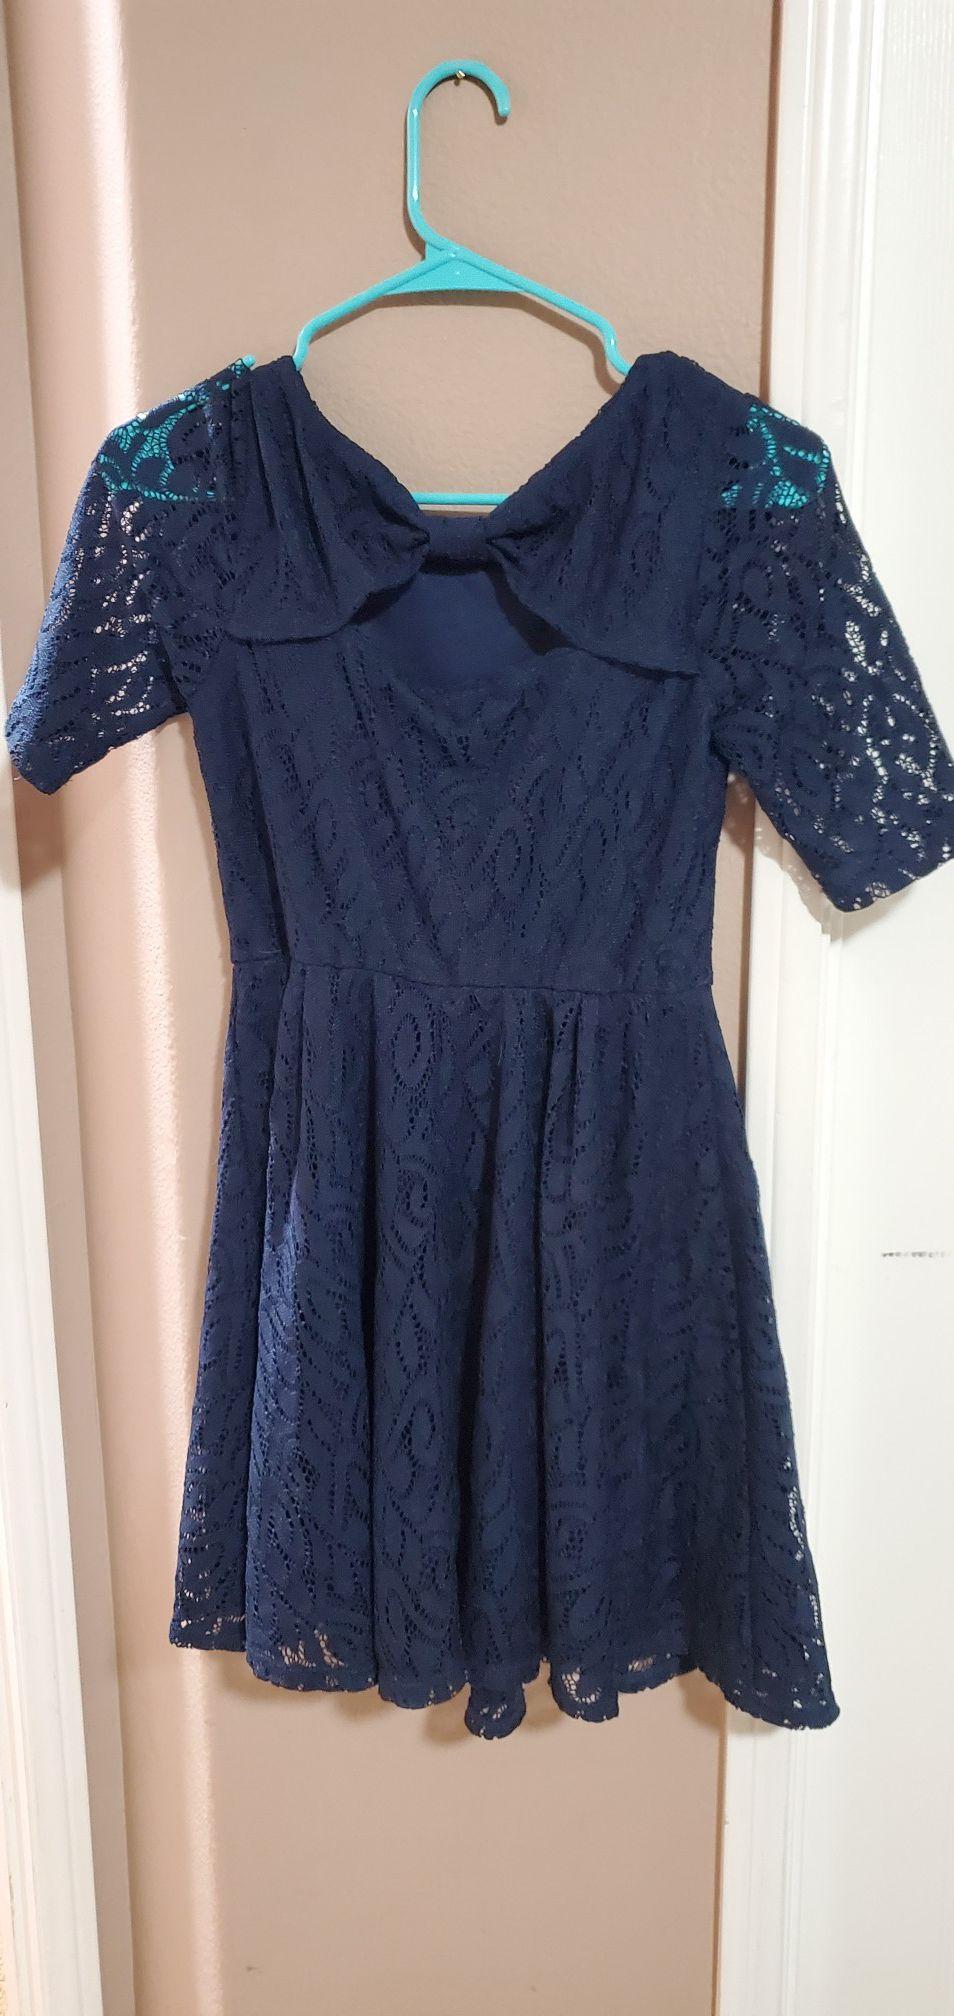 Girl's Dress Size 10